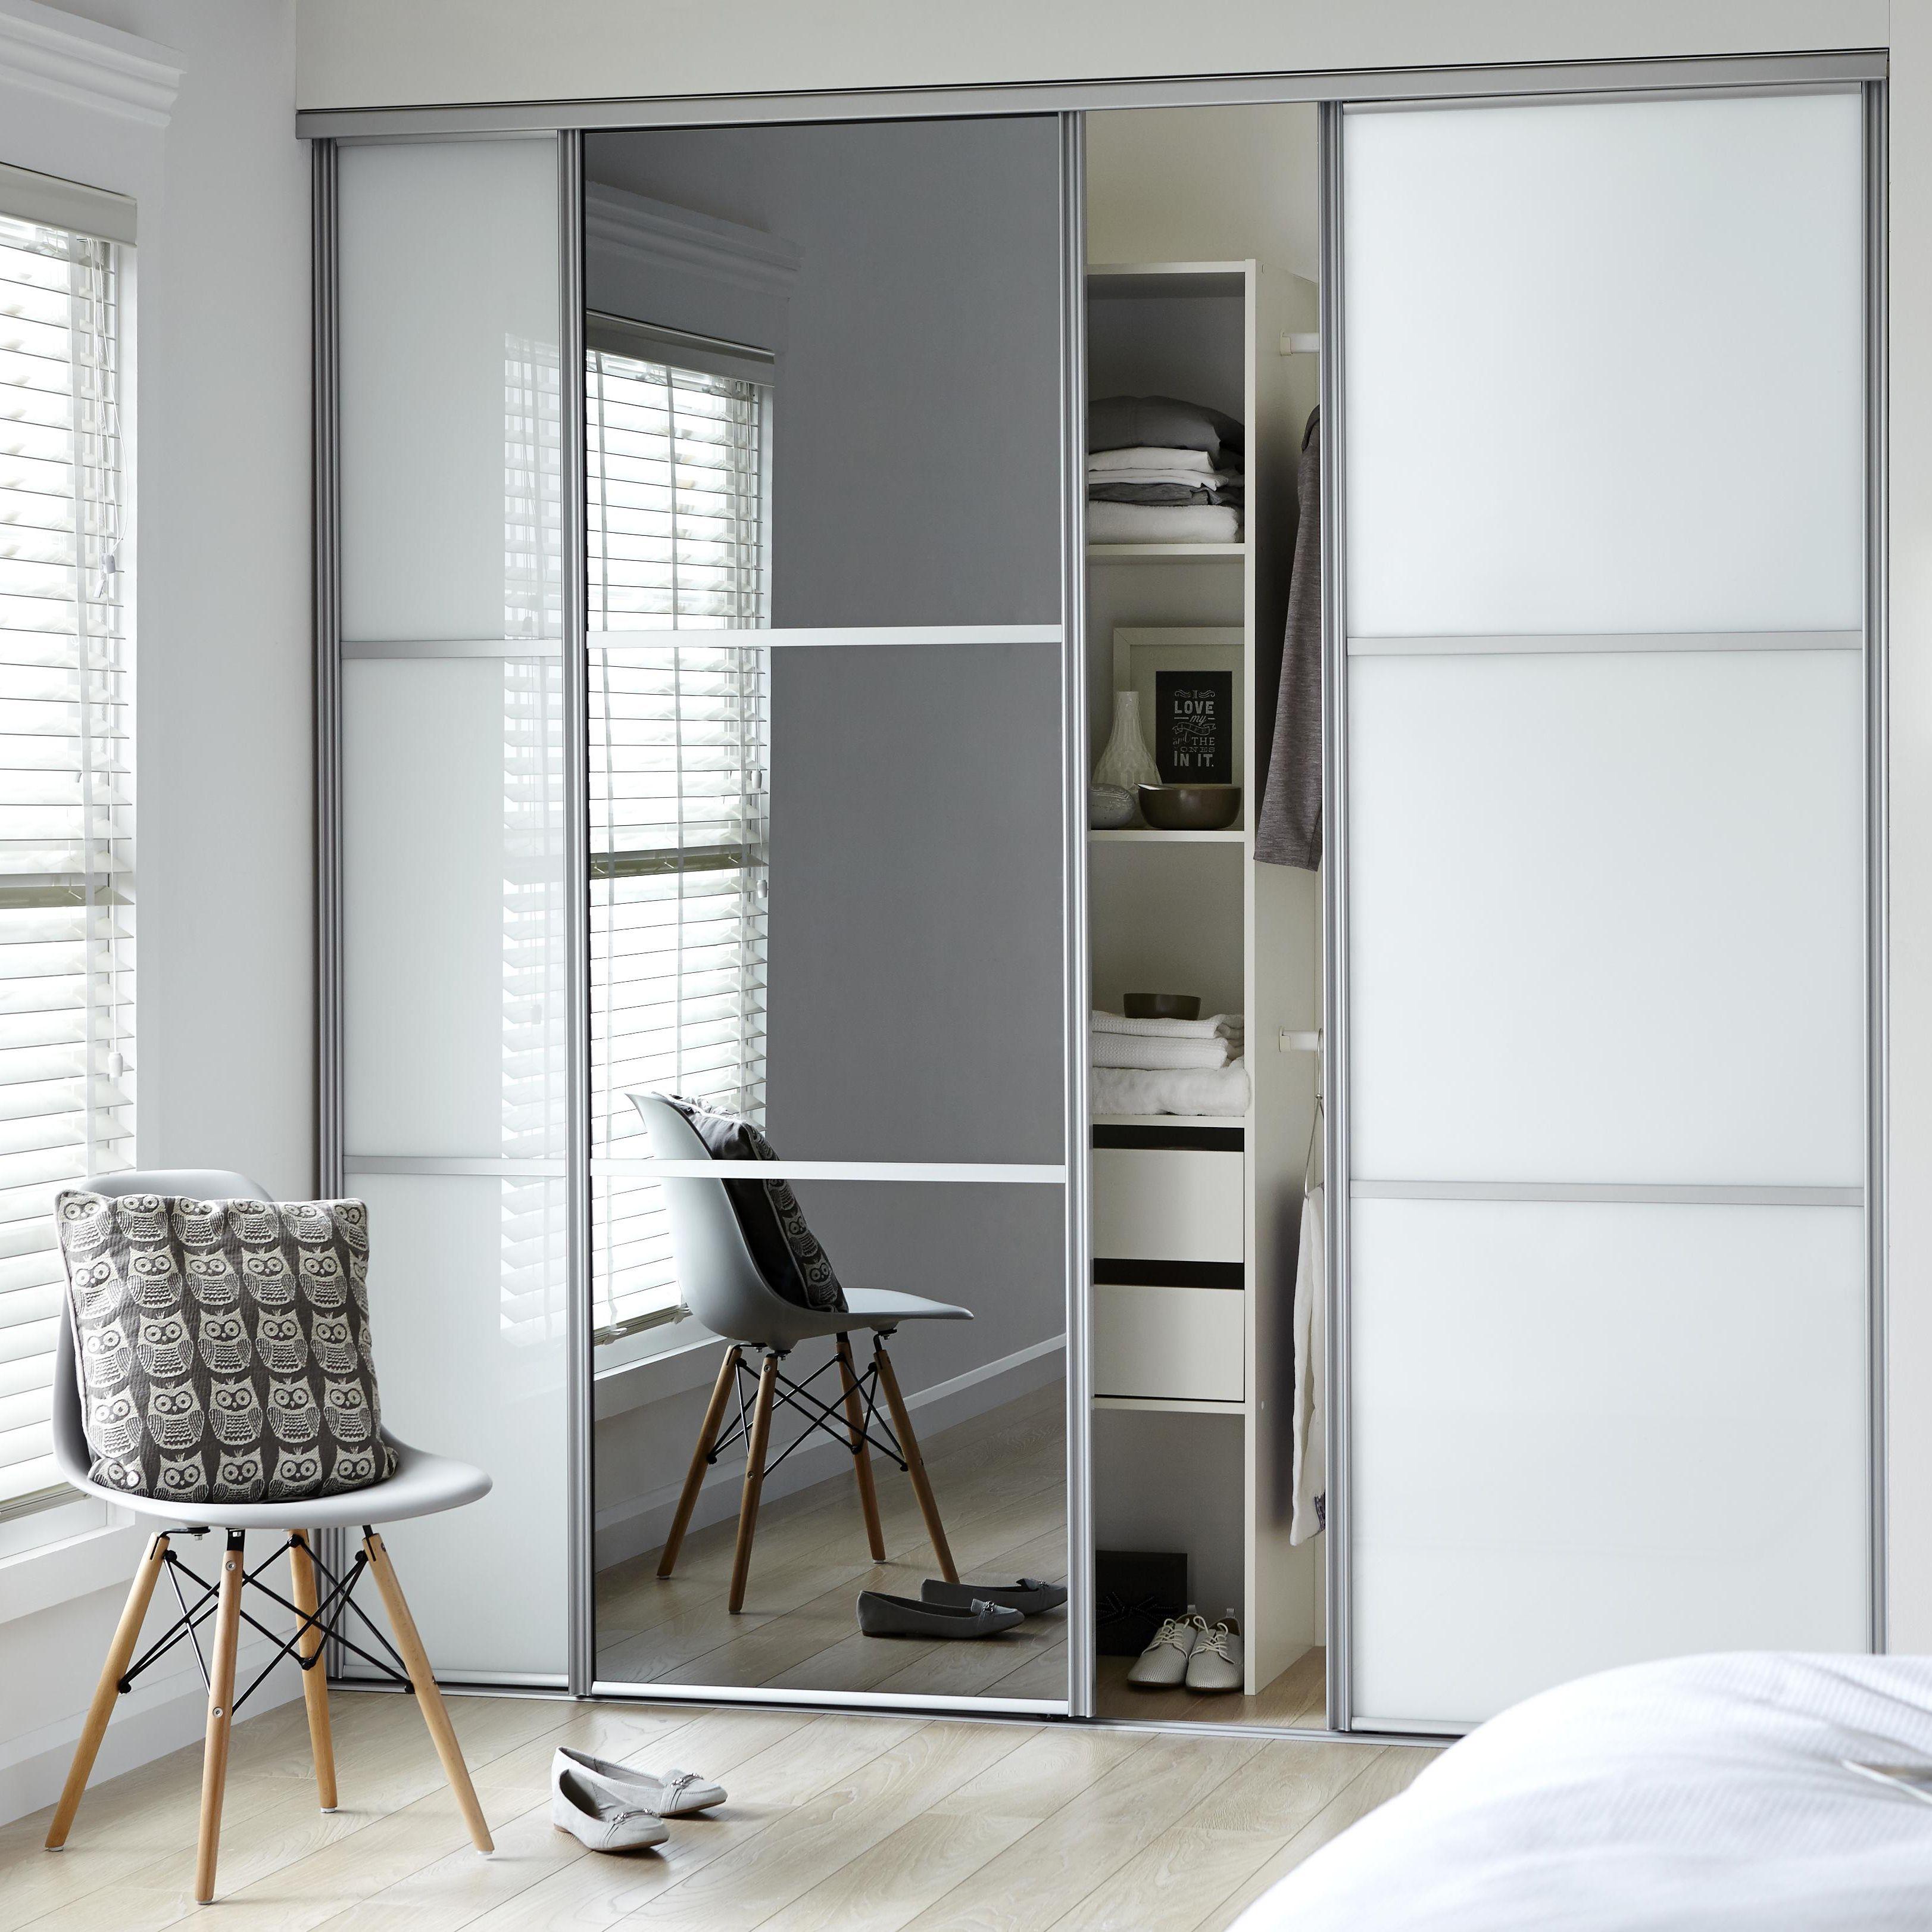 Ordinaire How To Measure U0026 Install Sliding Wardrobe Doors